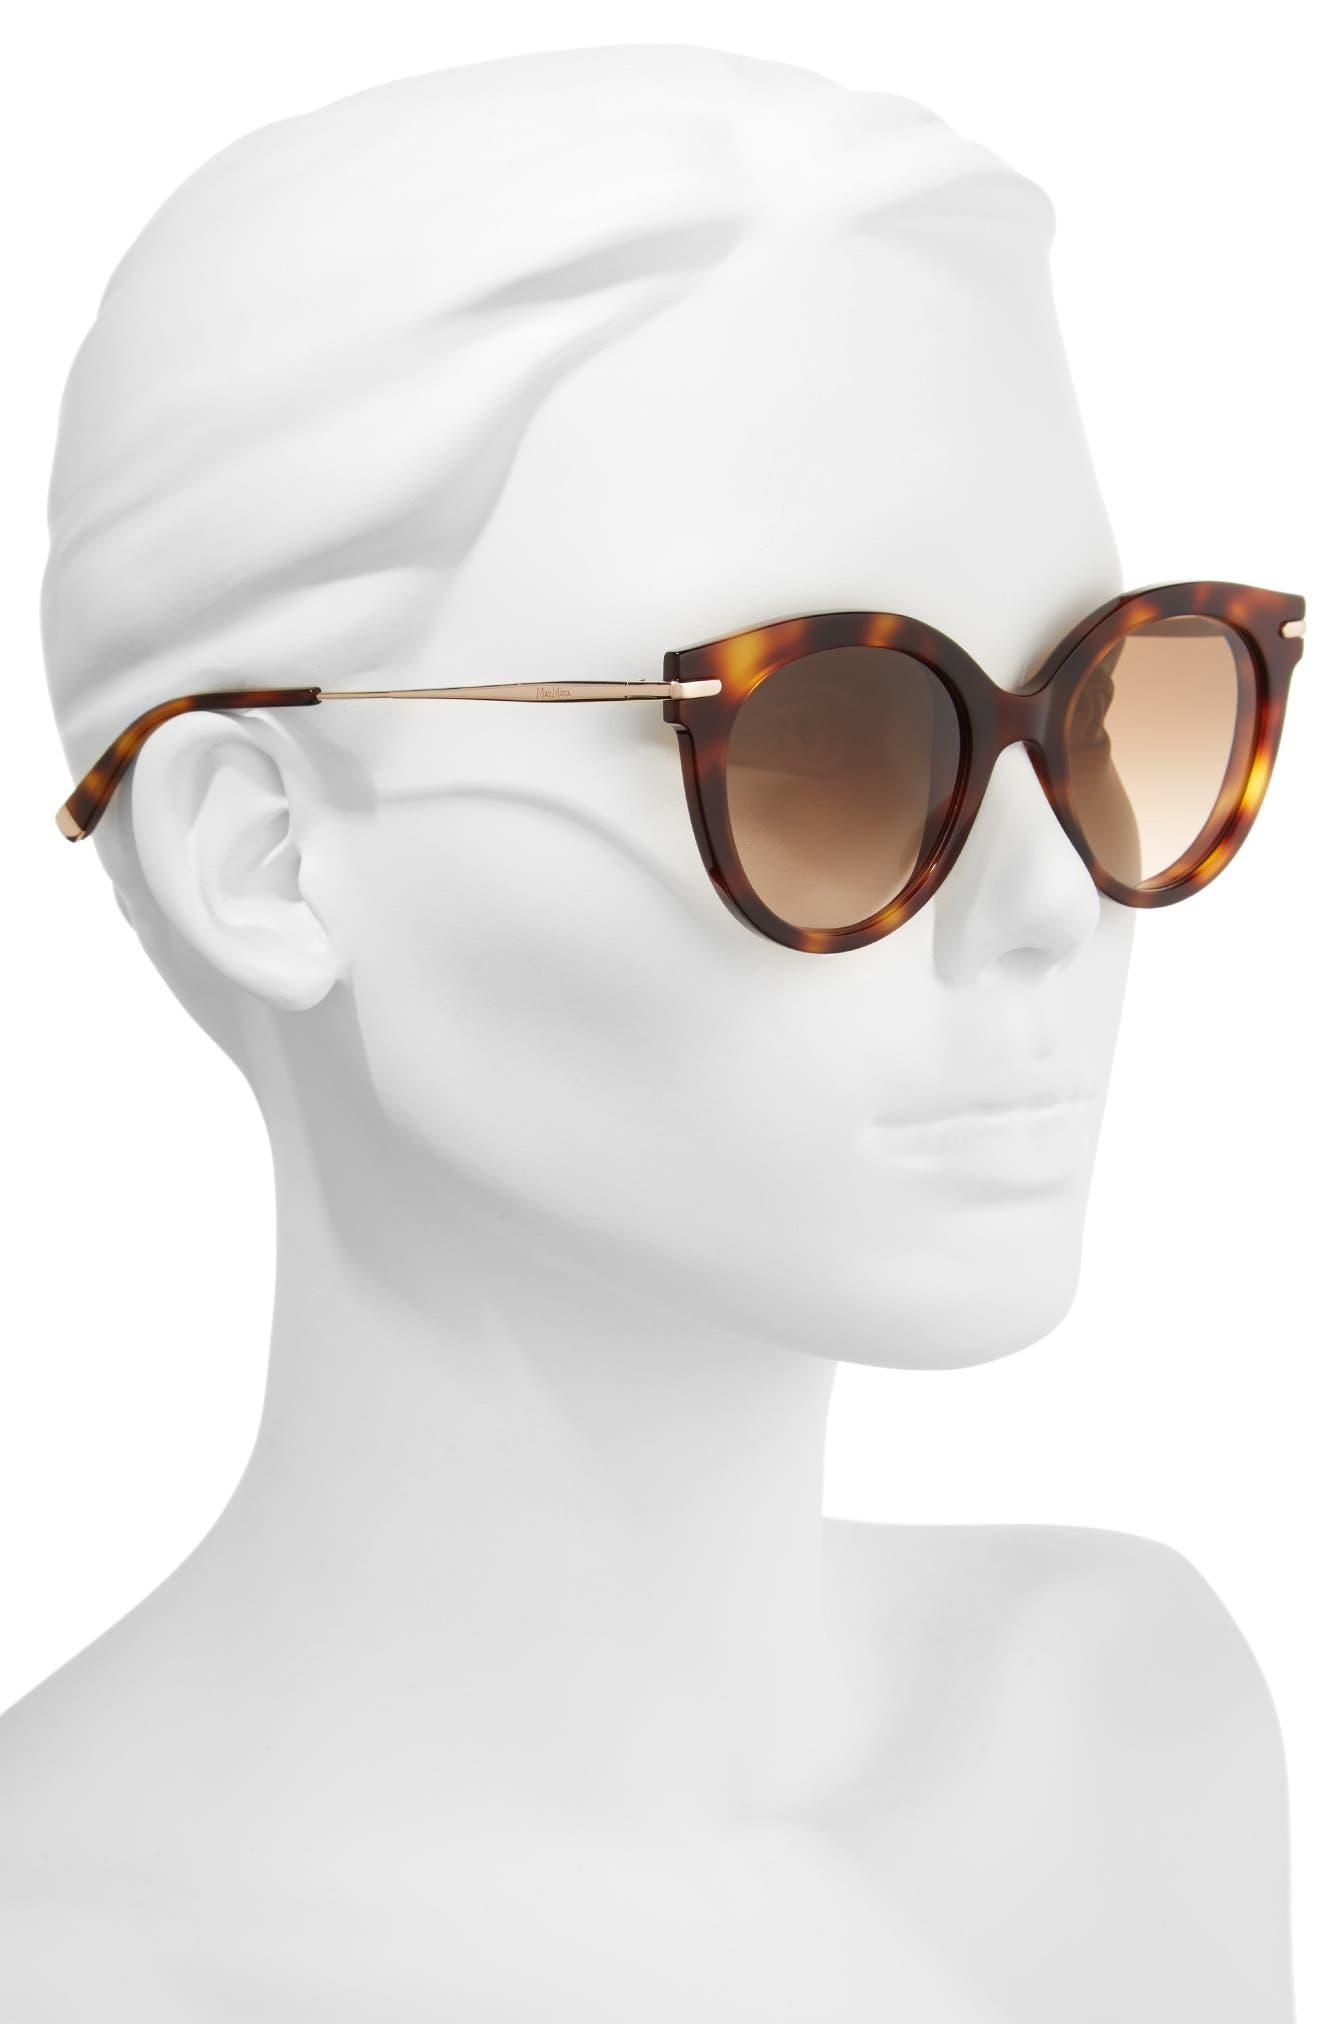 Needle VI 50mm Gradient Round Sunglasses,                             Alternate thumbnail 2, color,                             Havana Gold